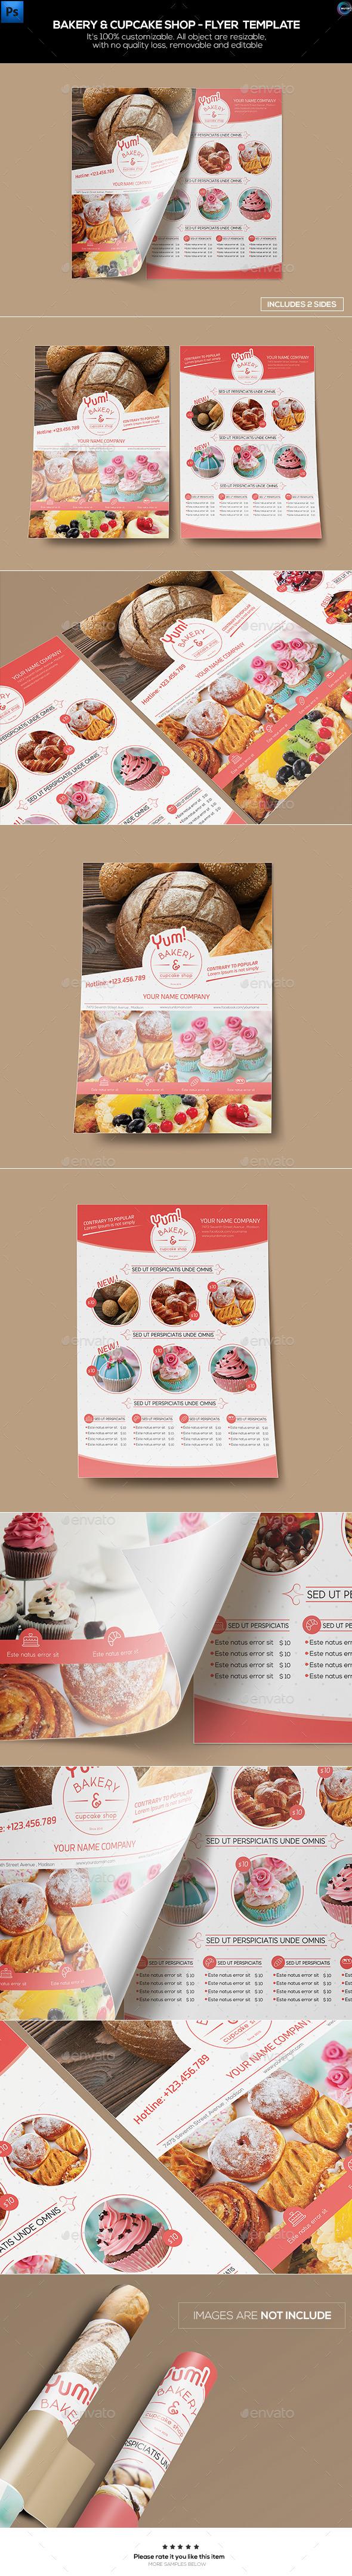 Bakery & Cupcake Shop Flyer Template